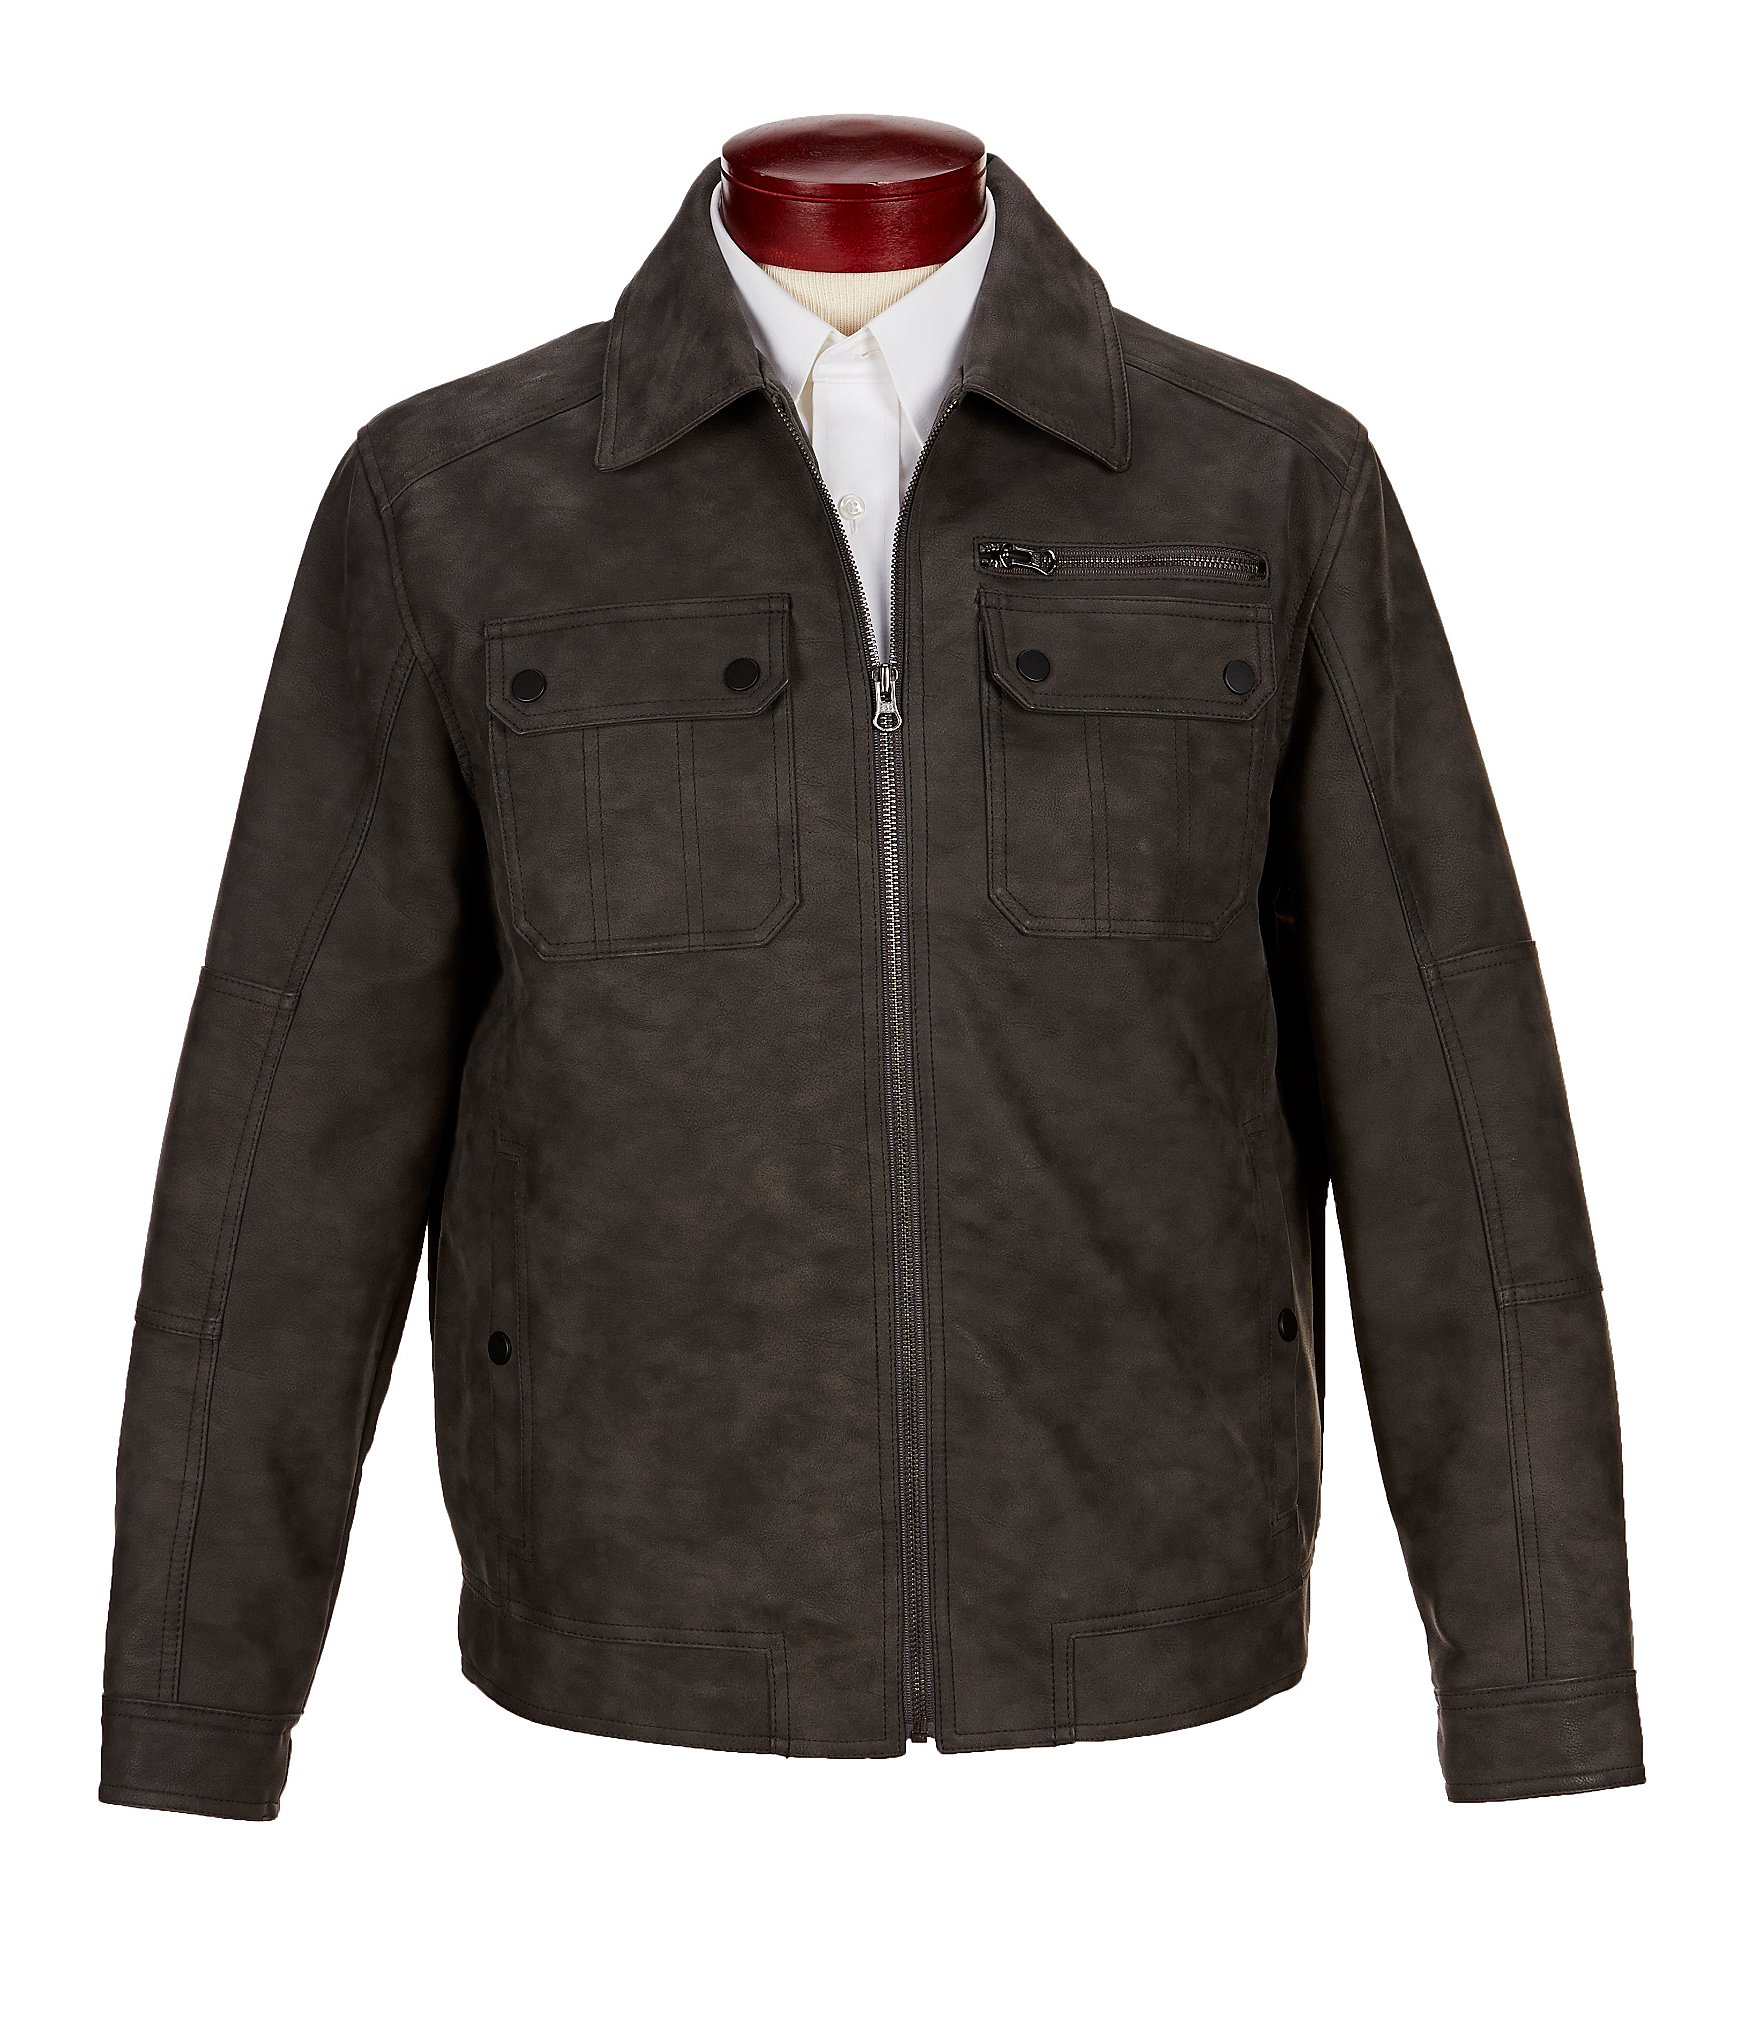 Dillards mens leather jackets